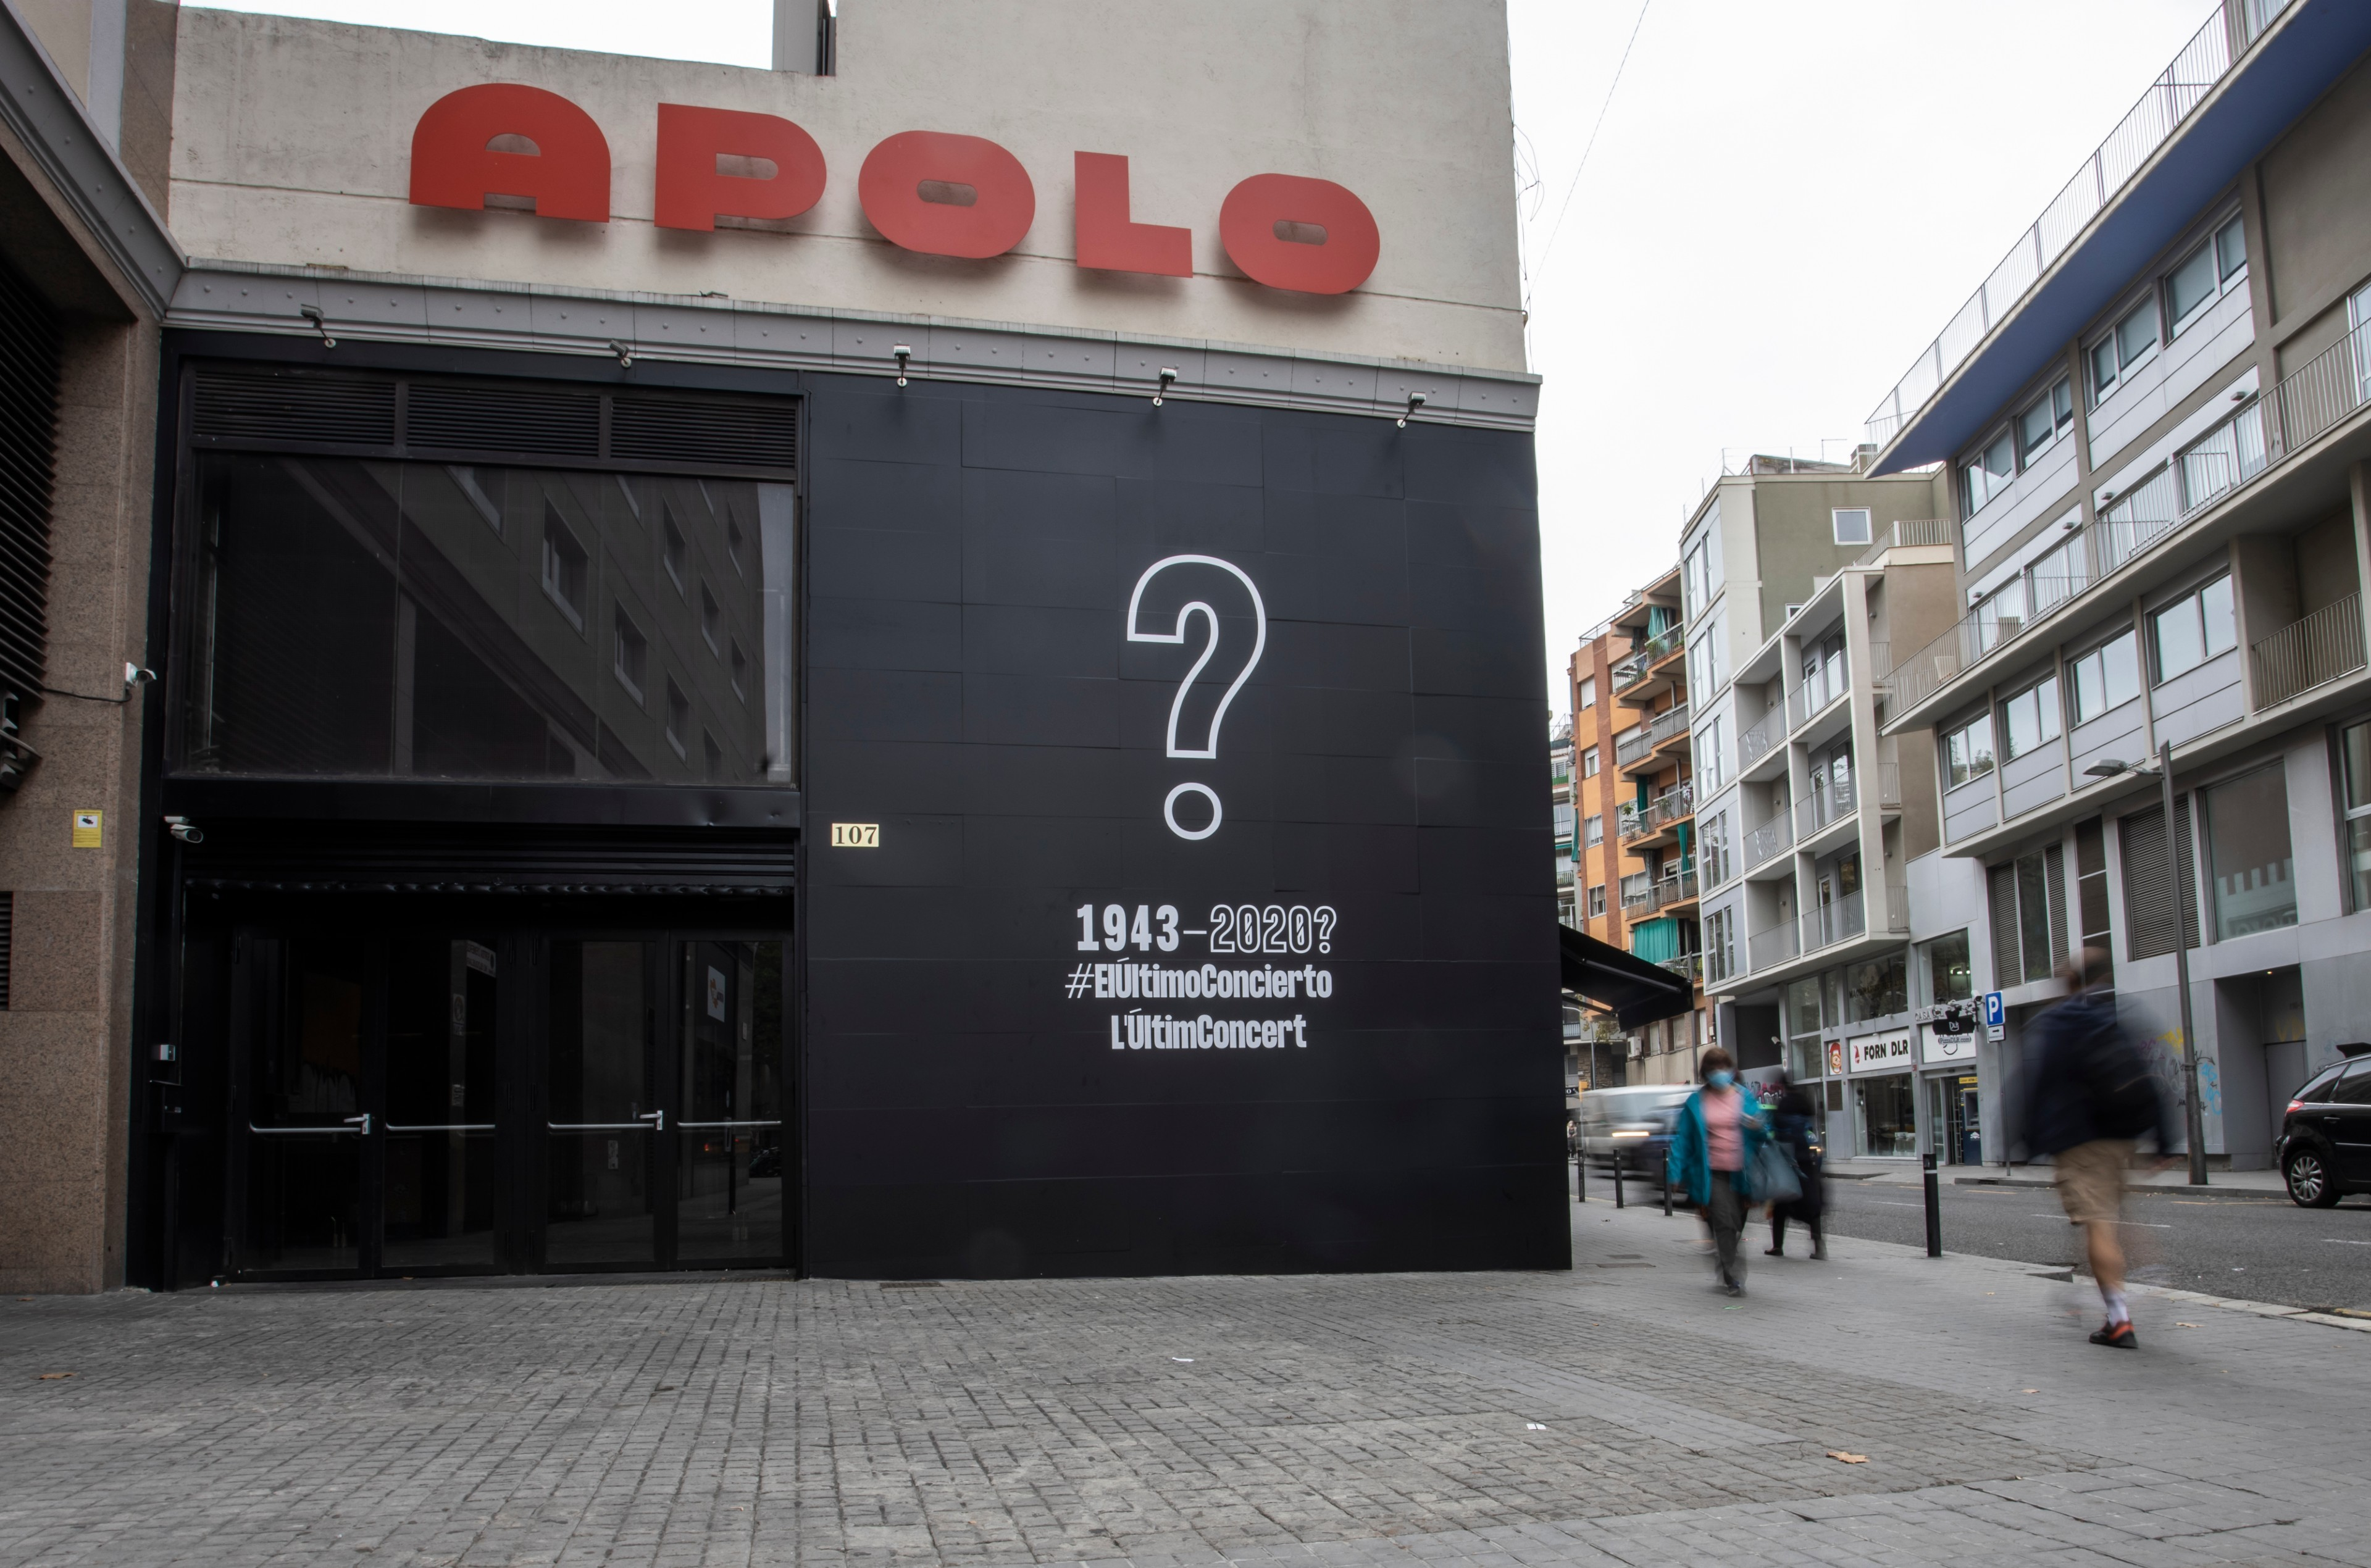 Apolo Theater Barcelona Spain